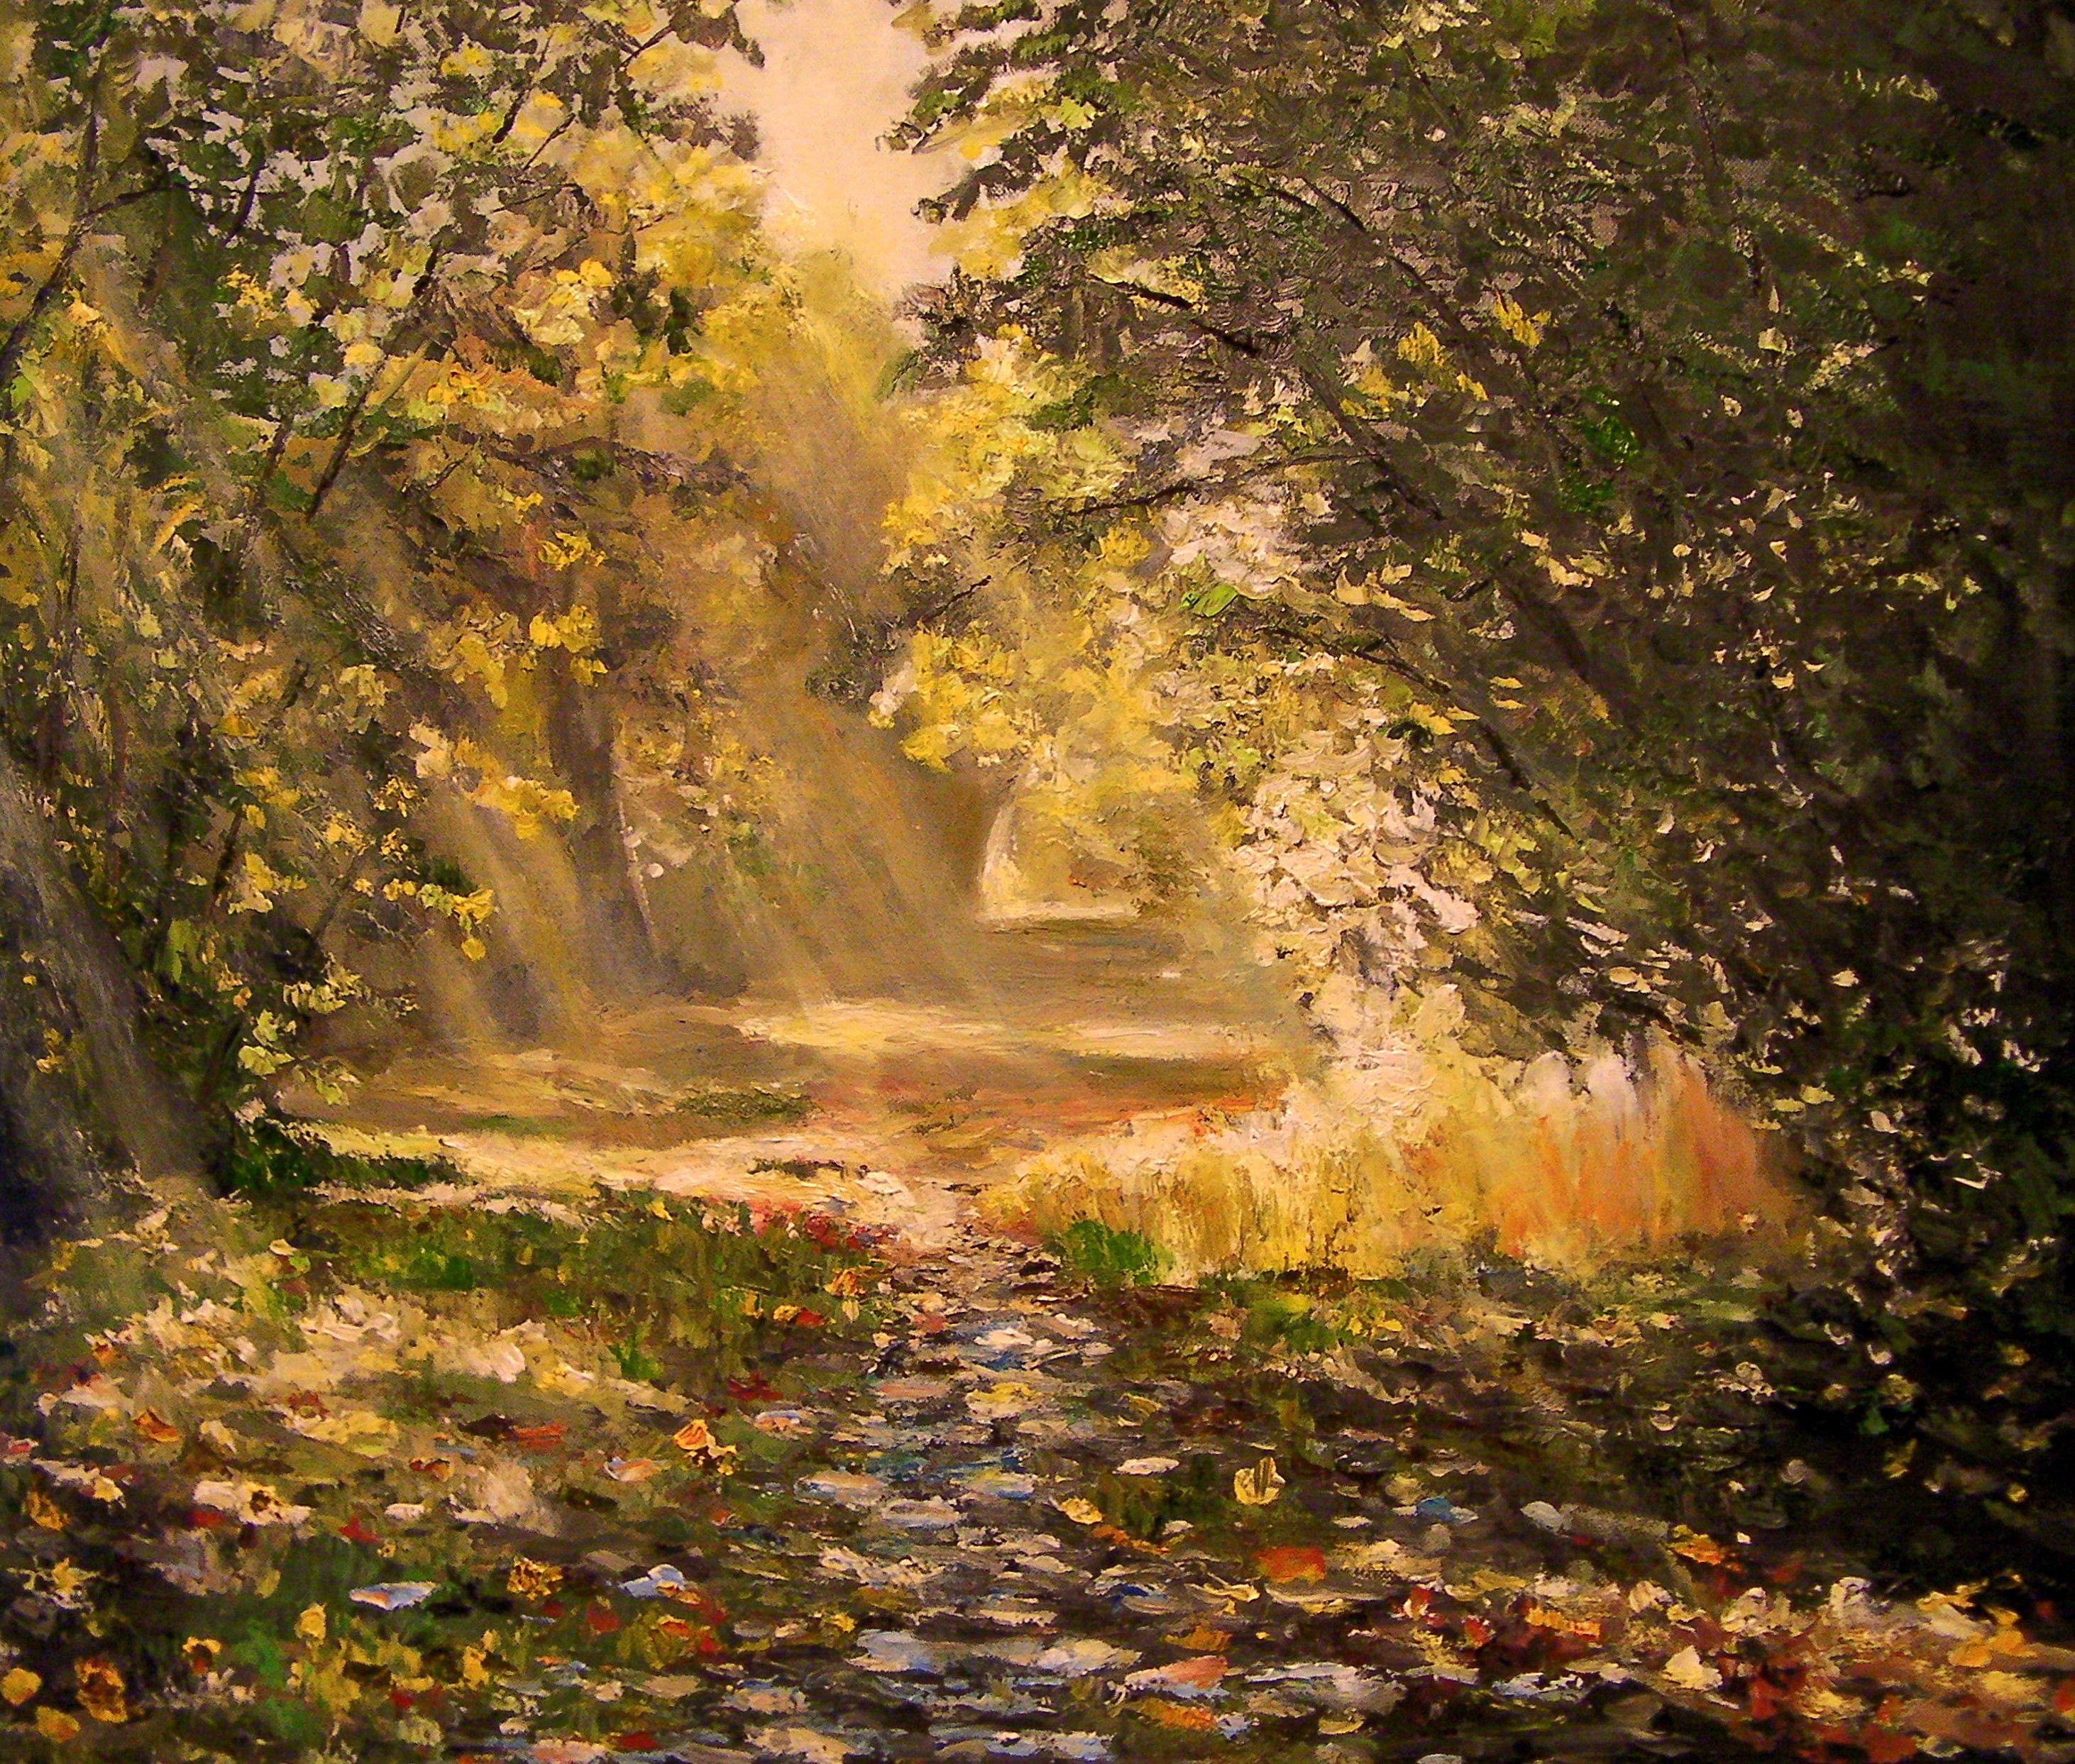 Campagne, peinture | Dipingere, Immagini